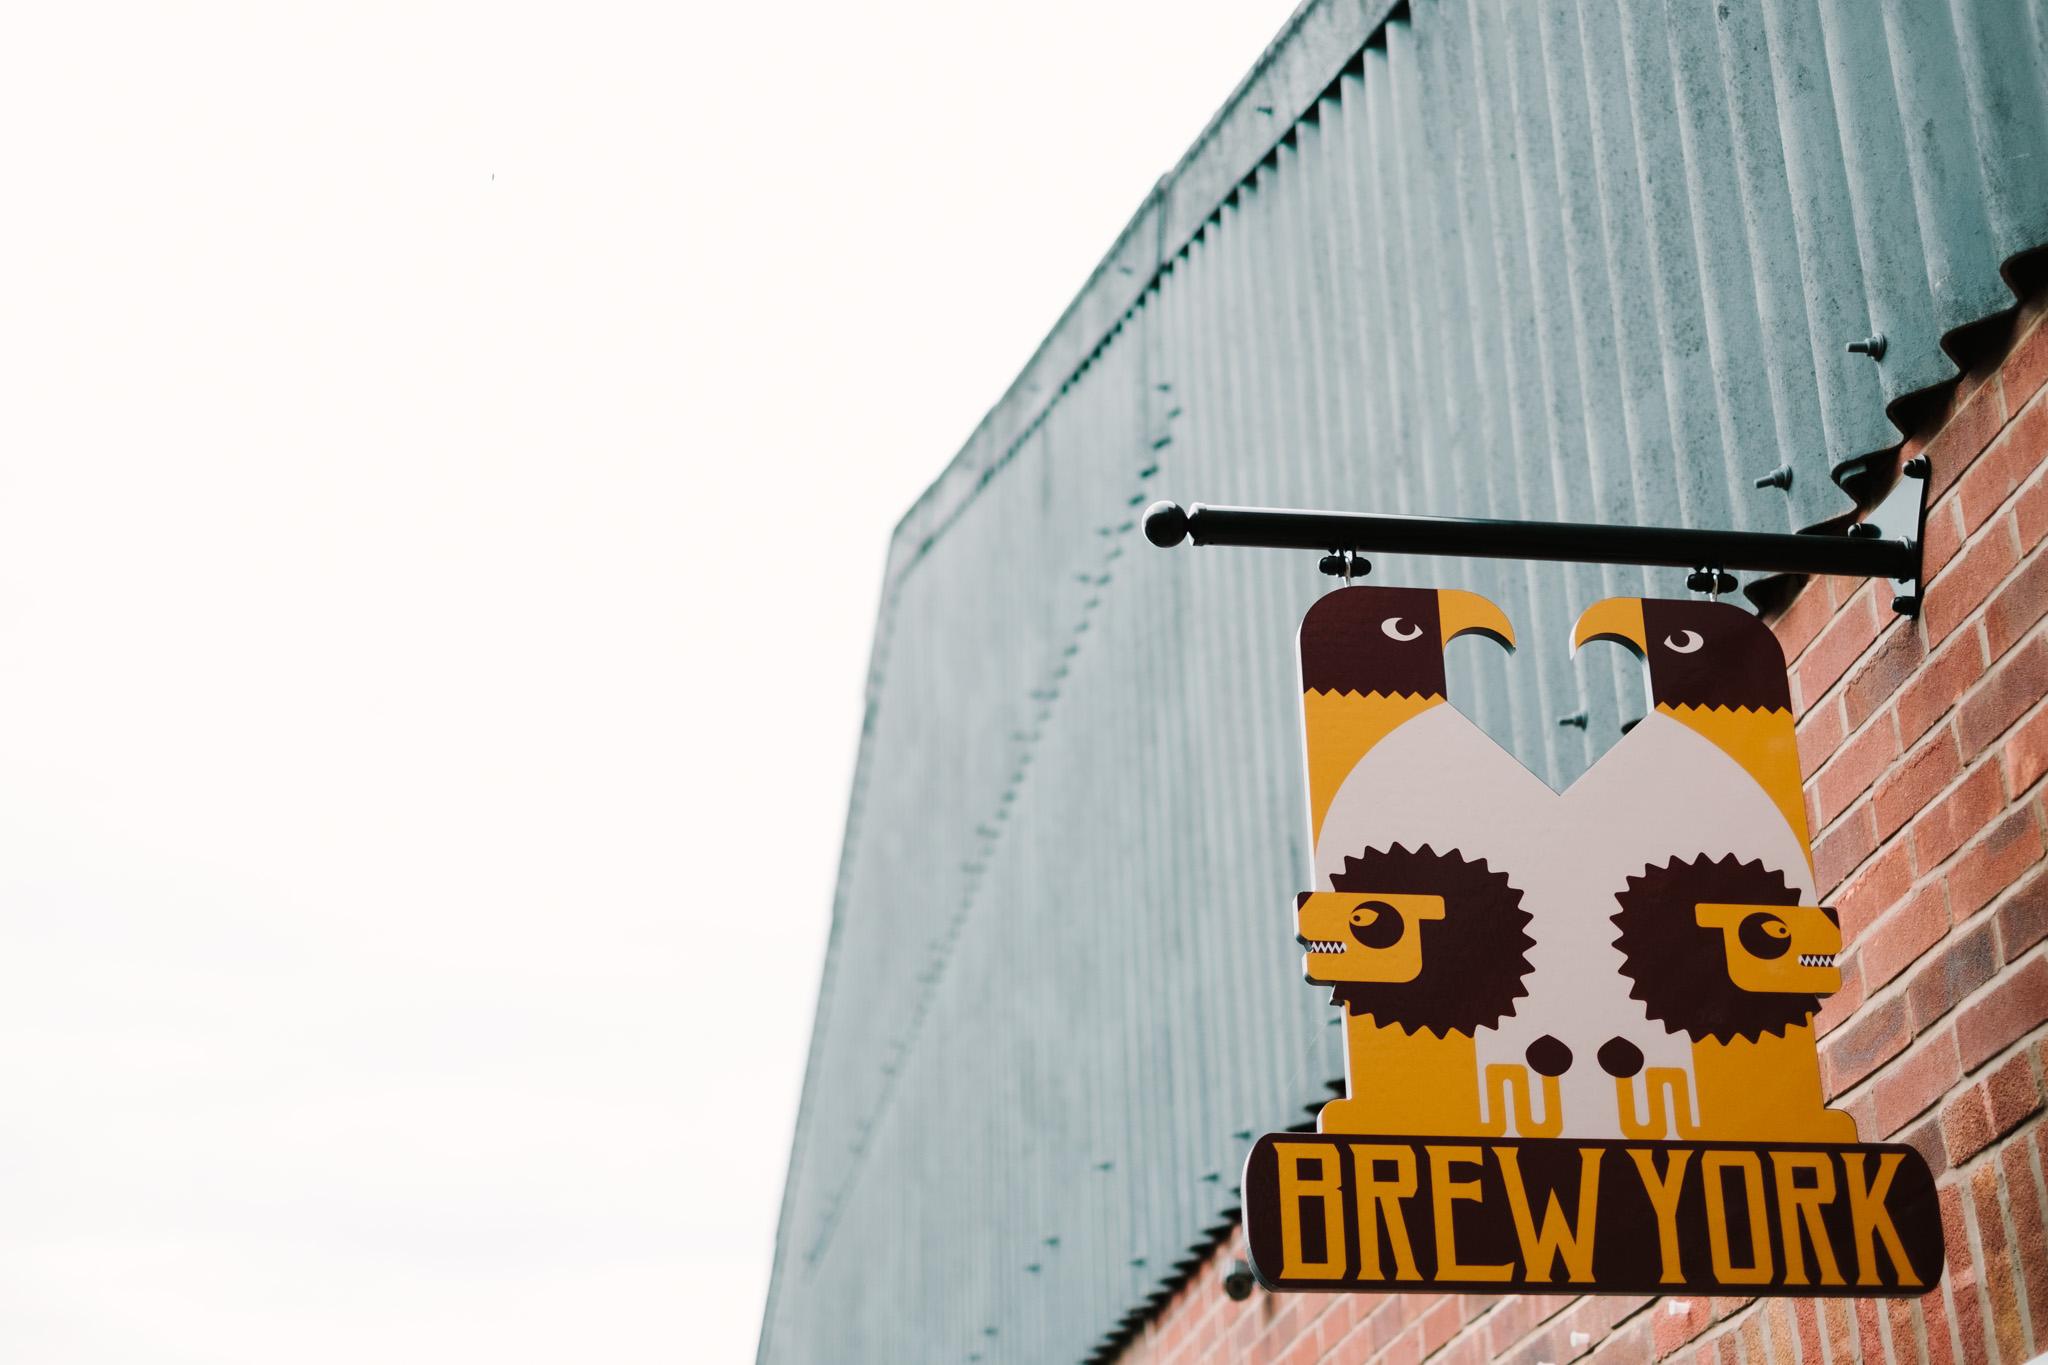 brew-york-160720-143339.jpg